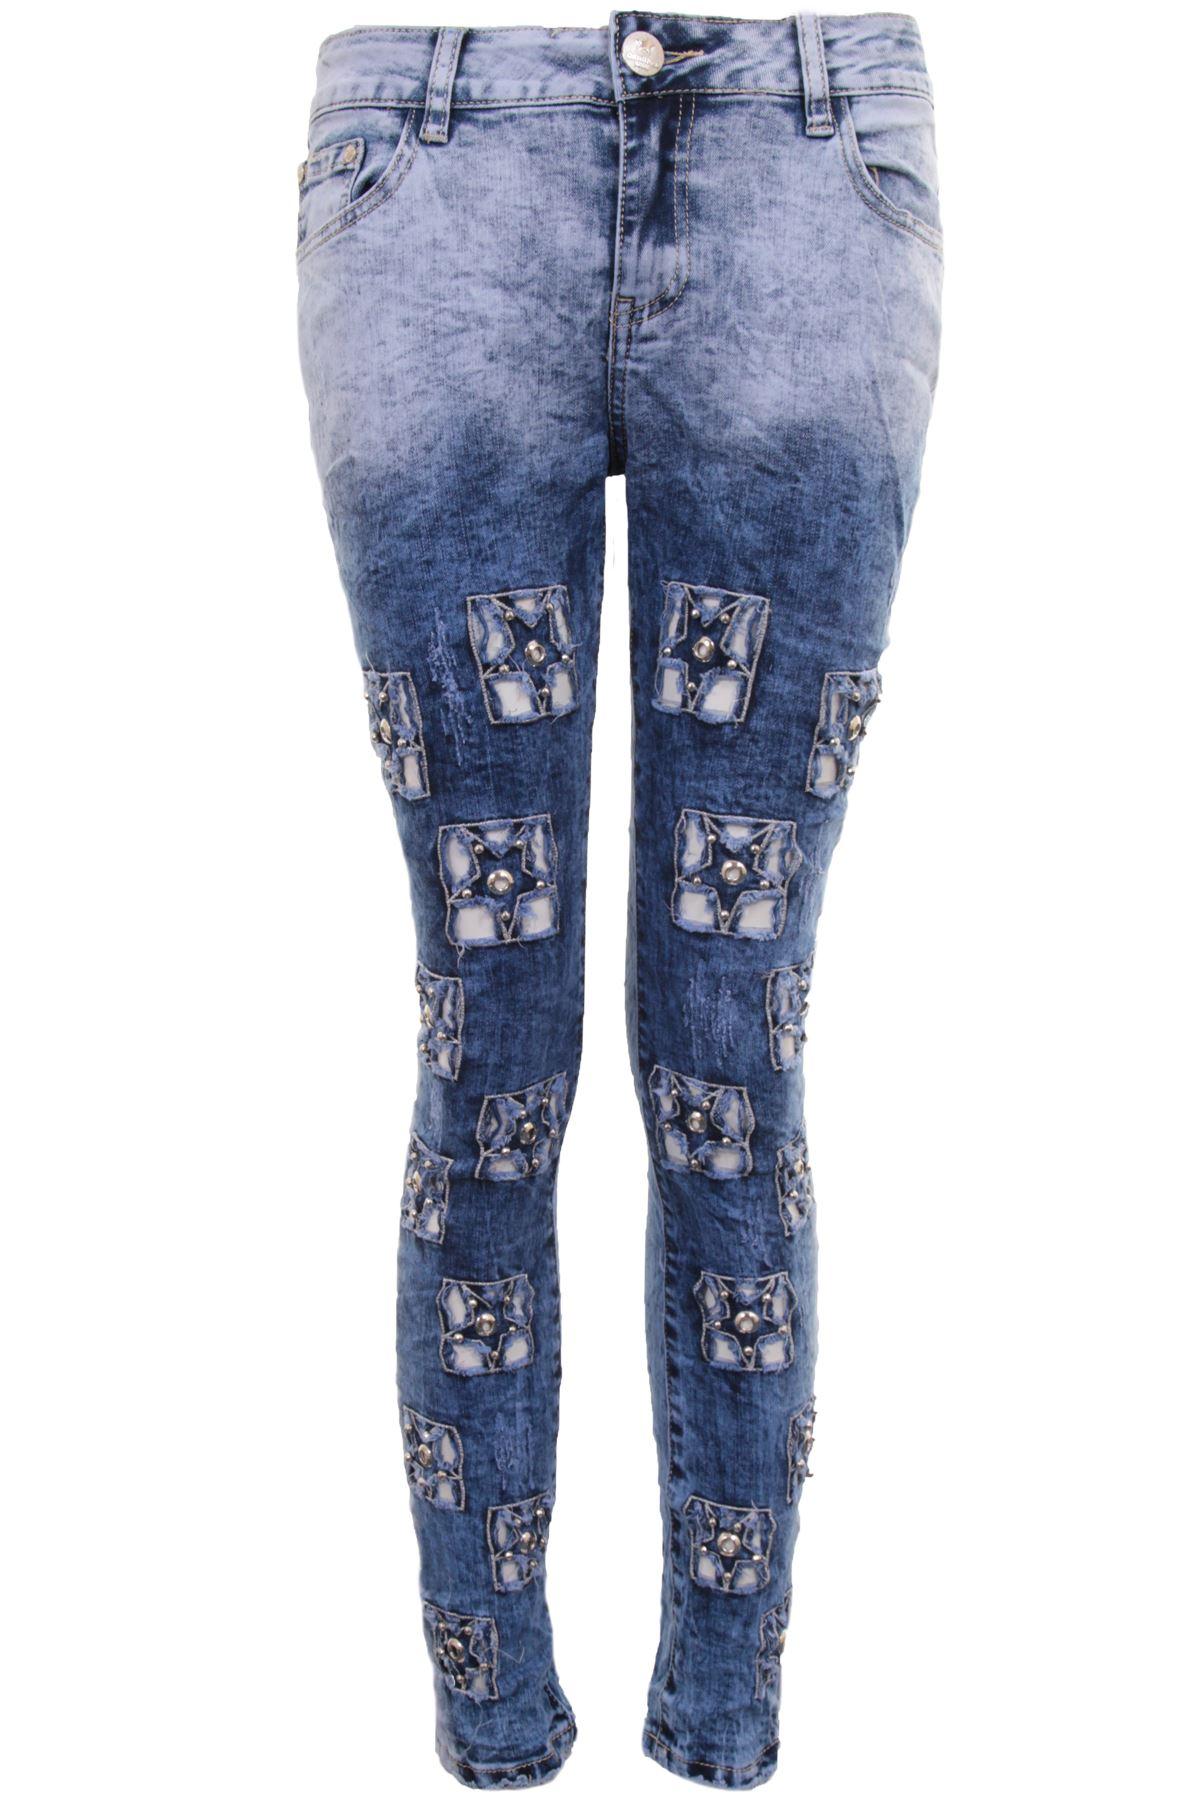 3cbc7730a8a Womens Light Denim Acid Wash Distressed Ripped Jewell Stat Skinny Fit Jeans